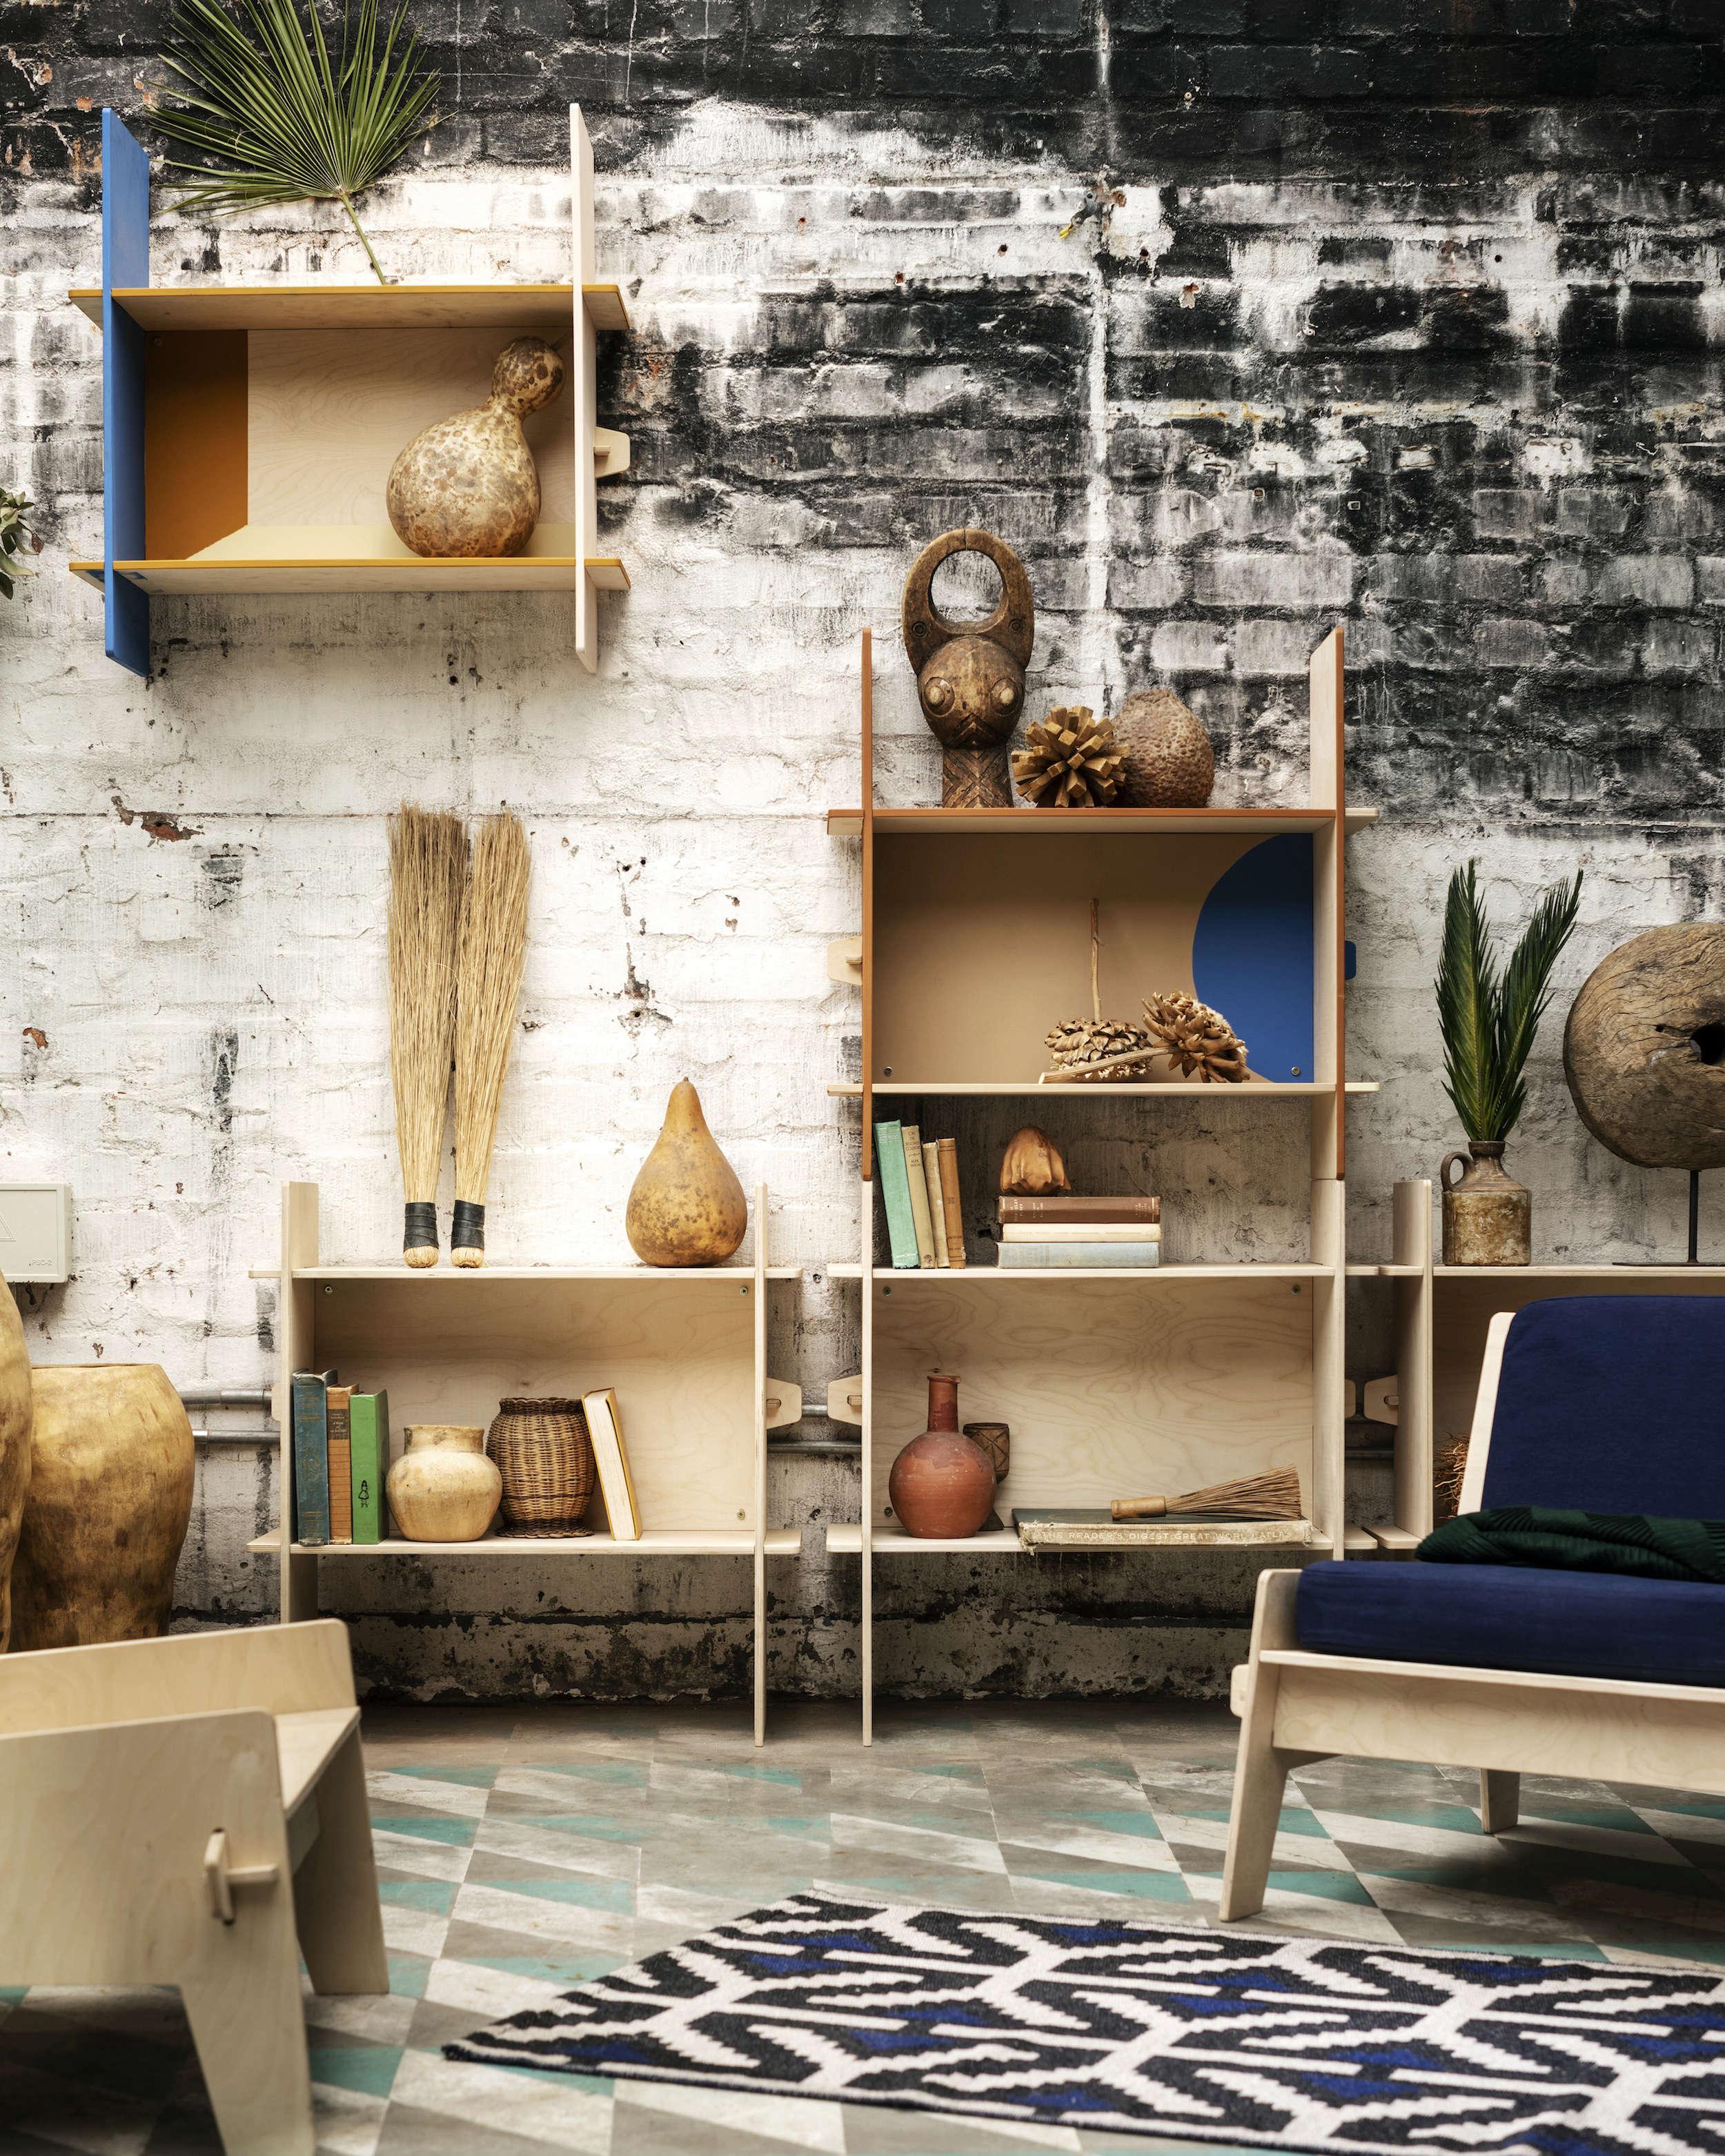 Ikea Overallt Collection